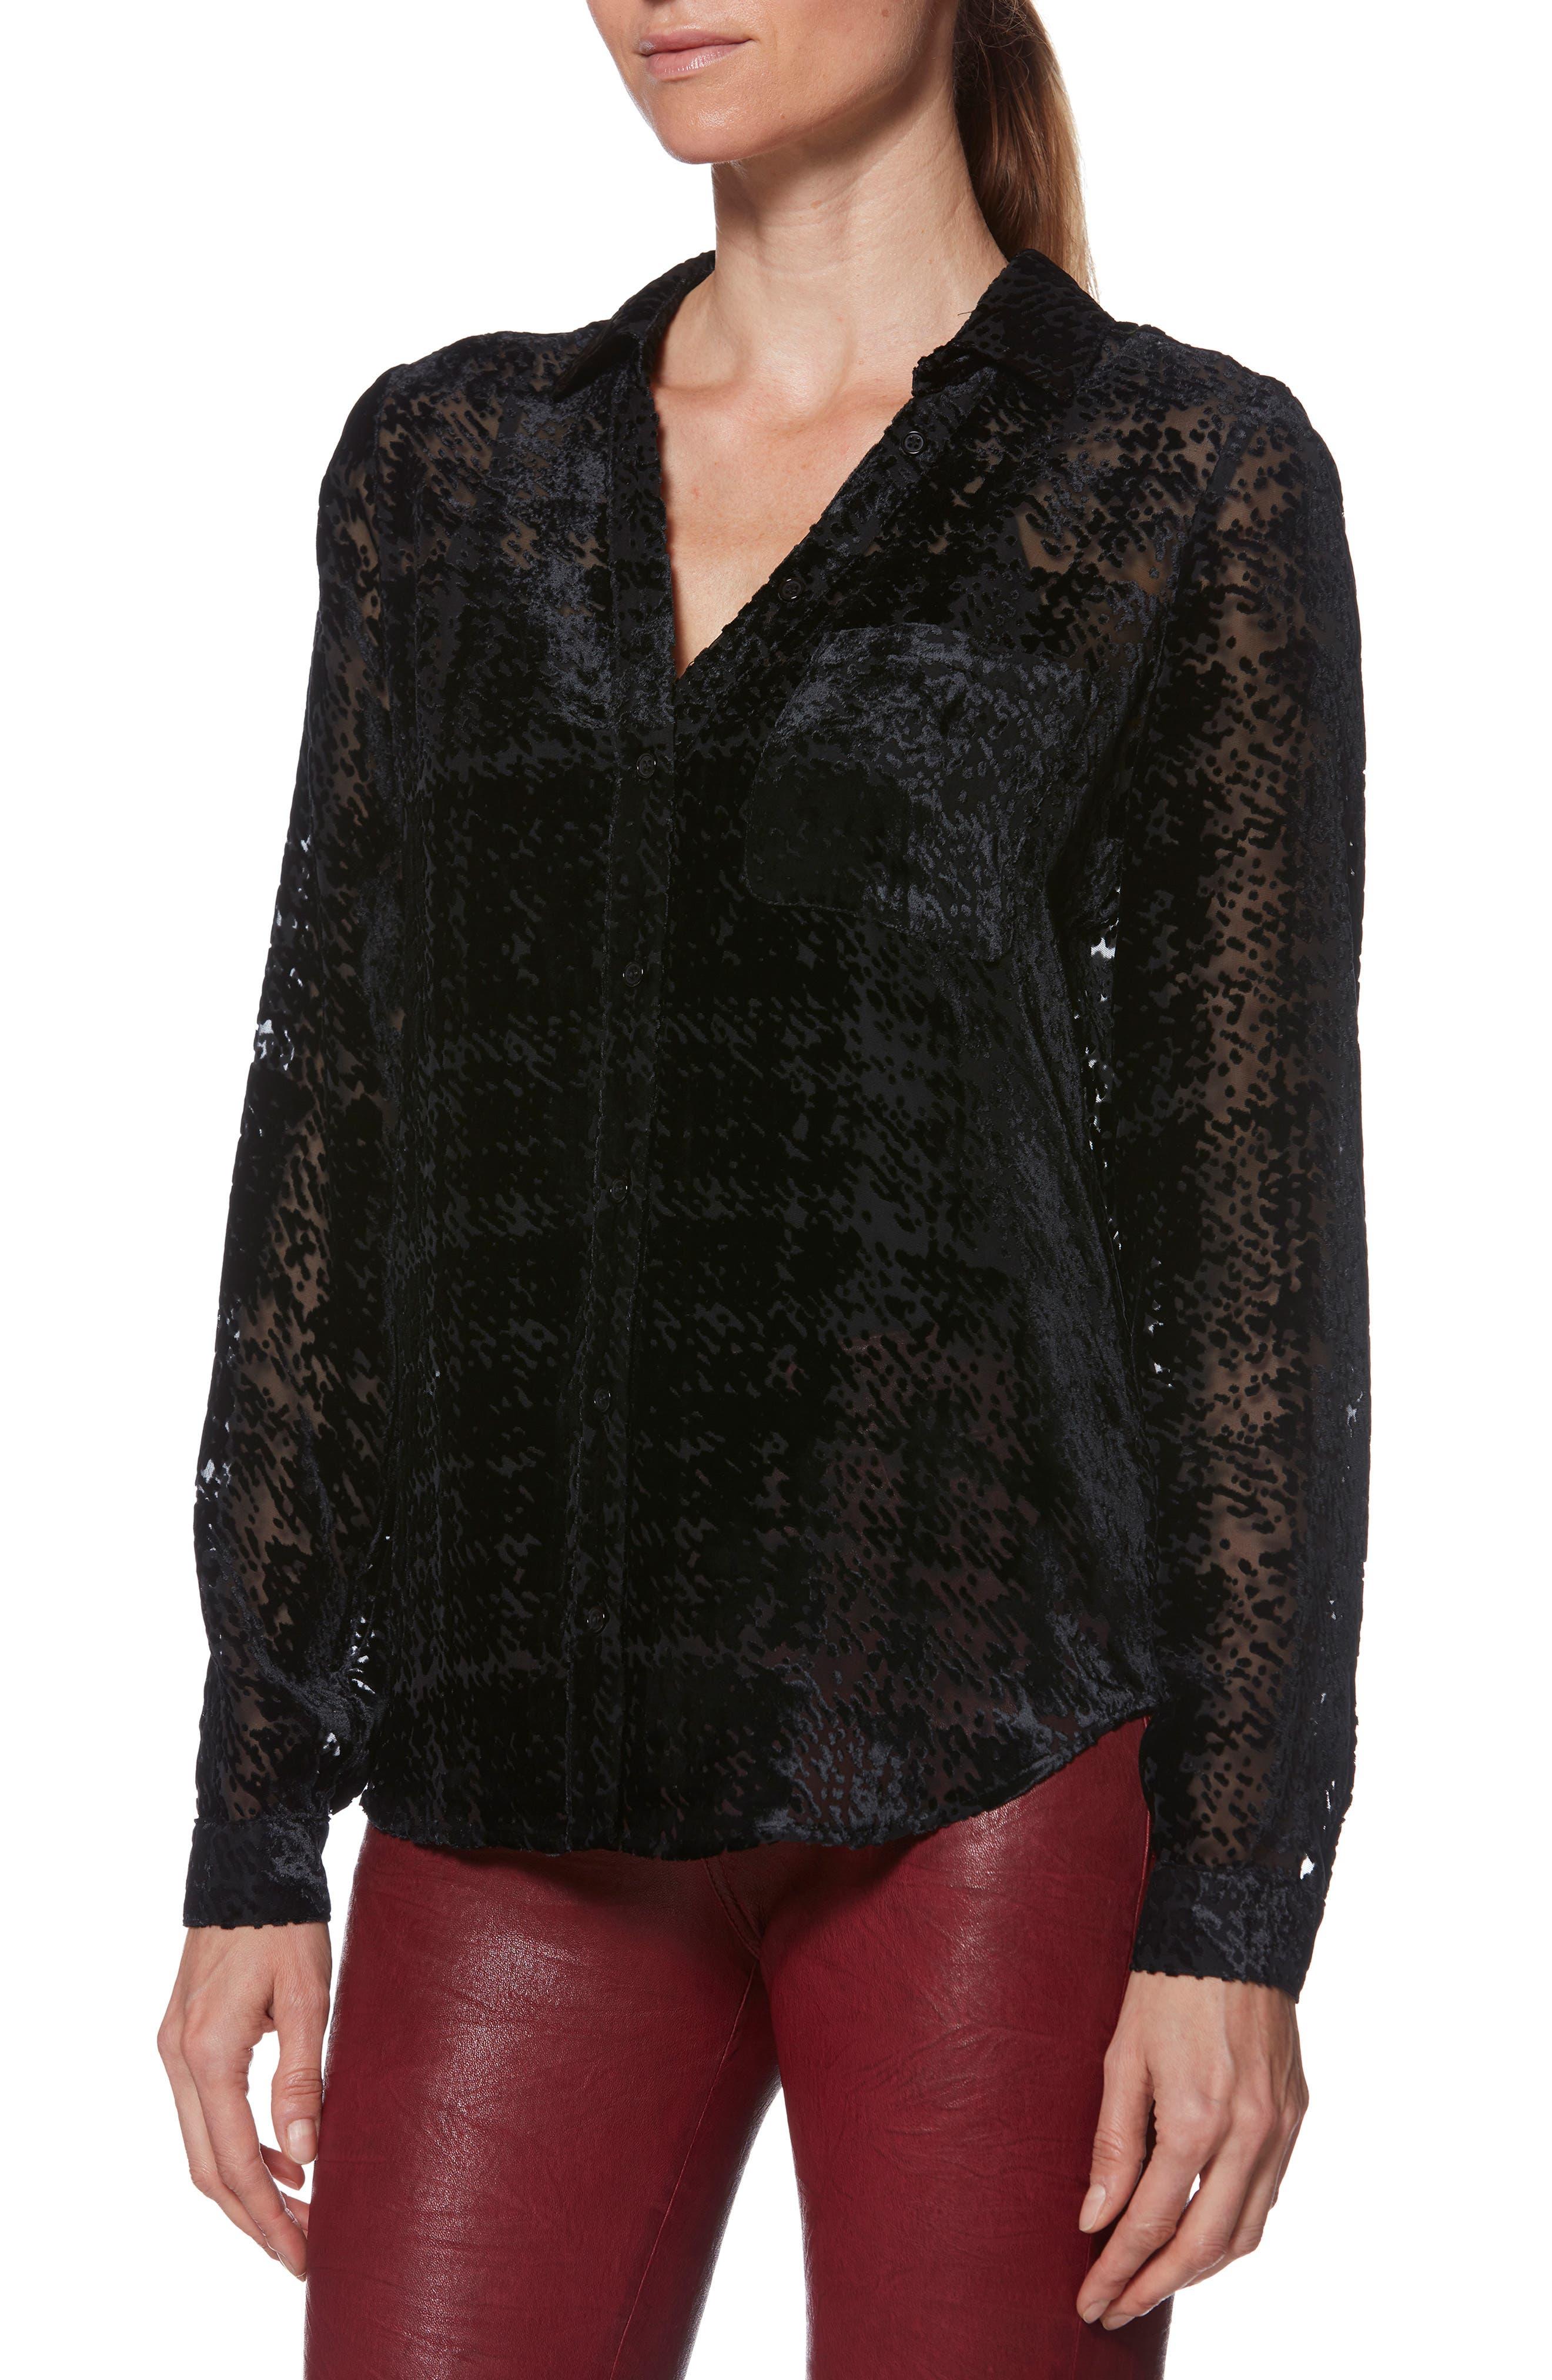 Linara Burnout Velvet Top,                         Main,                         color, BLACK